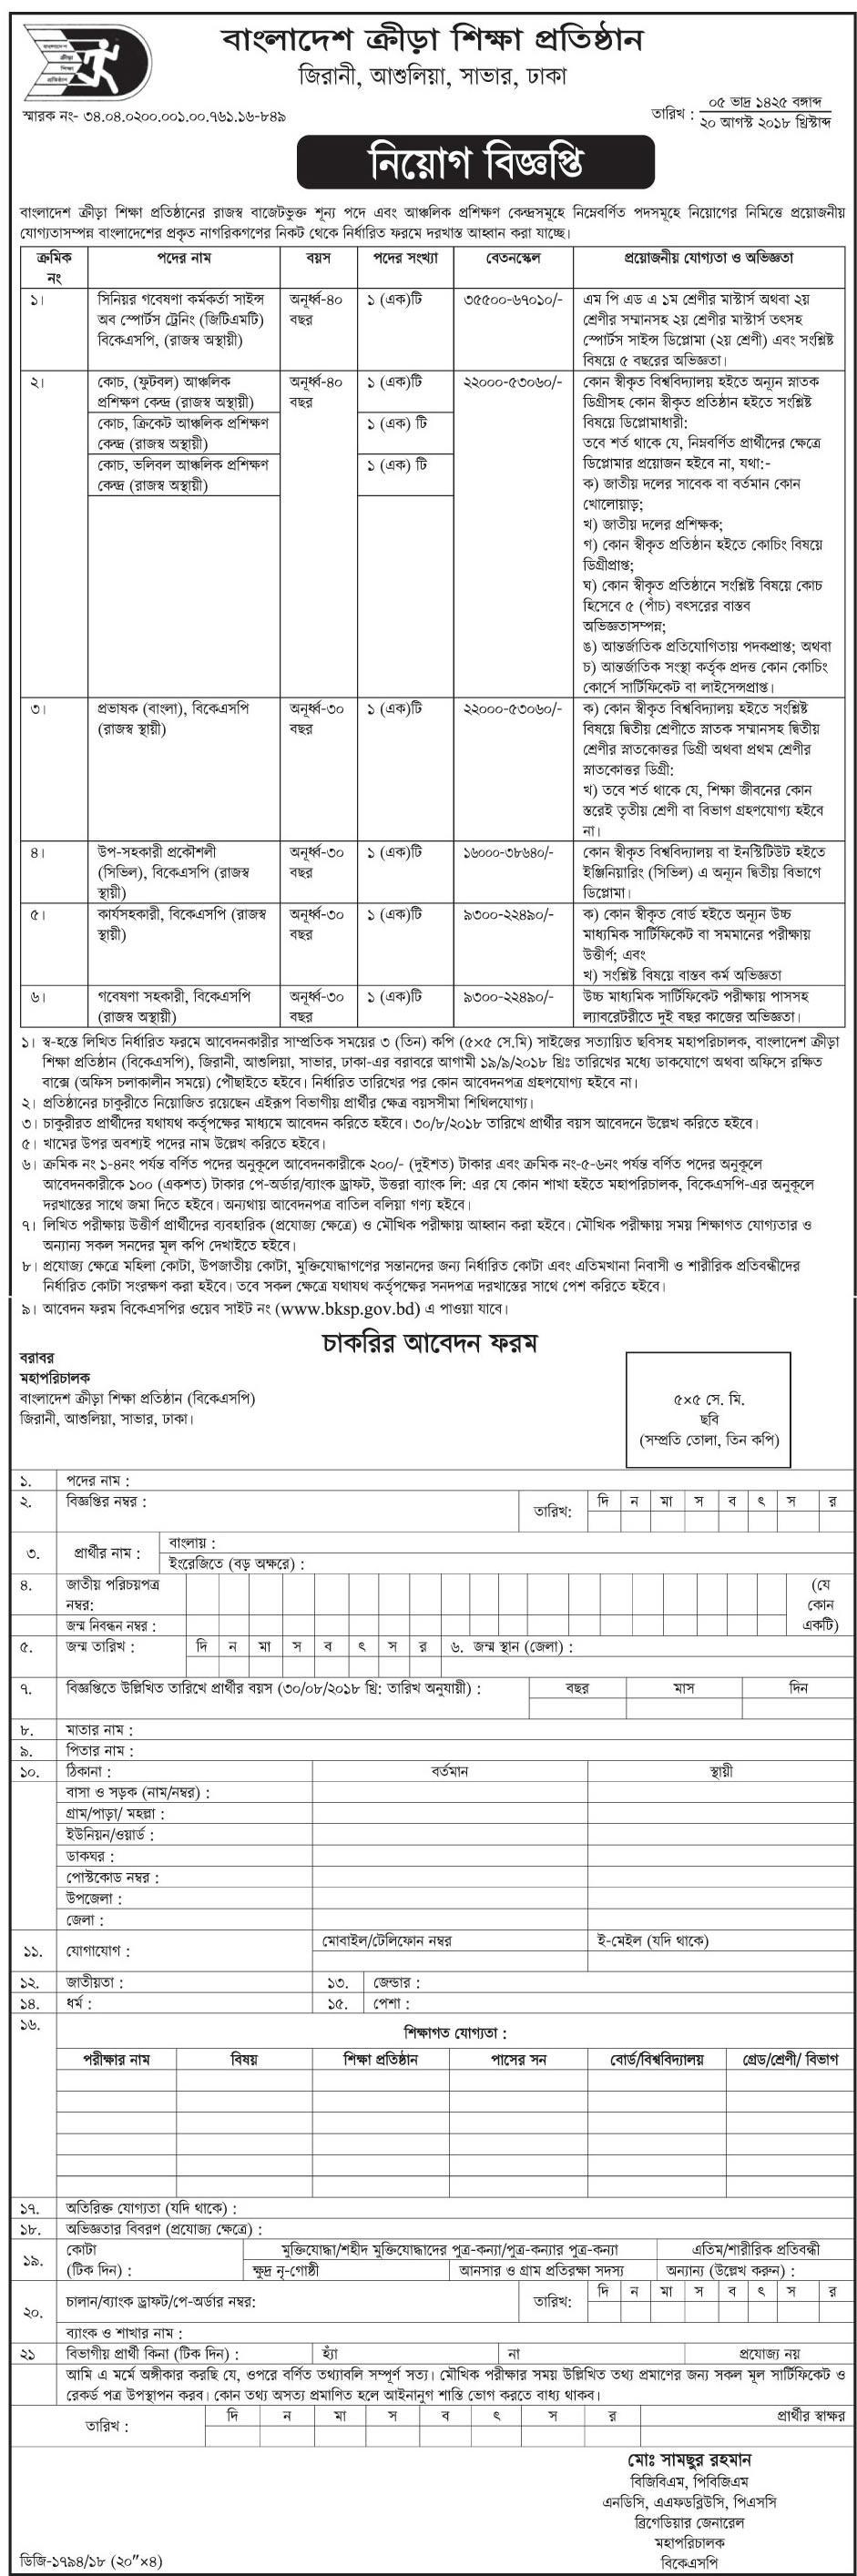 Bangladesh Krira Shikkha Protishtan BKSP job circular -2018